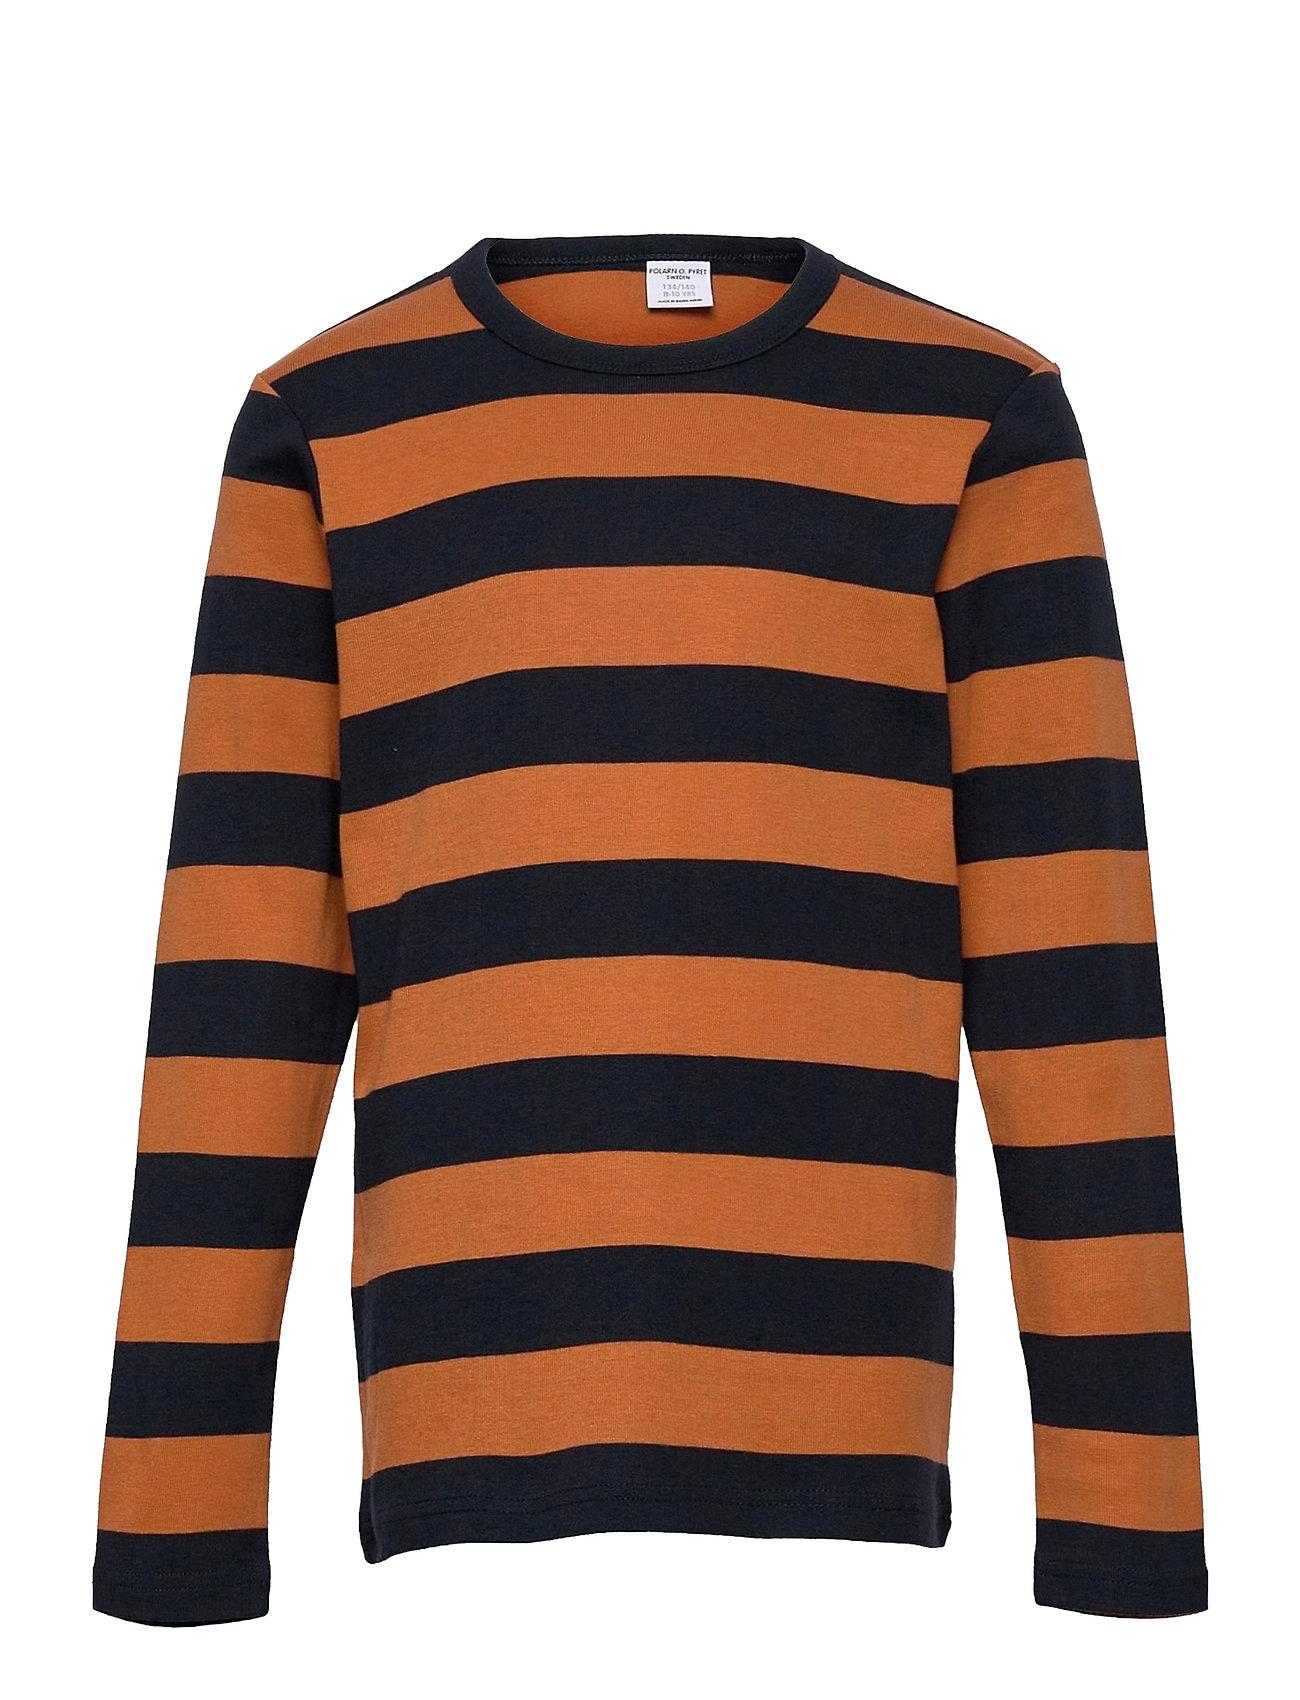 T-Shirt L/S Stripe School Langærmet T-shirt Multi/mønstret Polarn O. Pyret